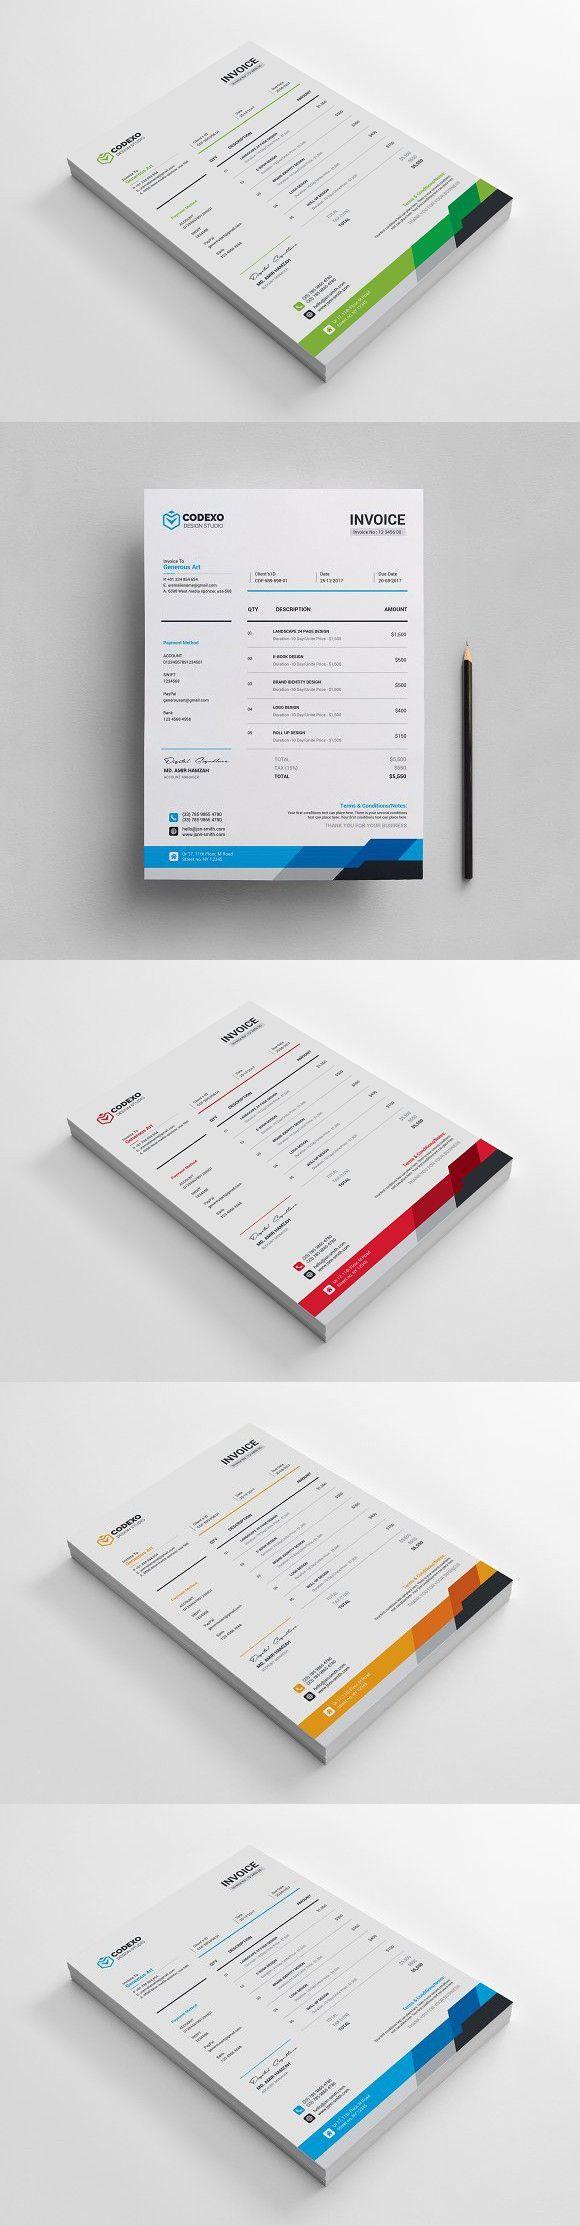 Invoice. Stationery Templates